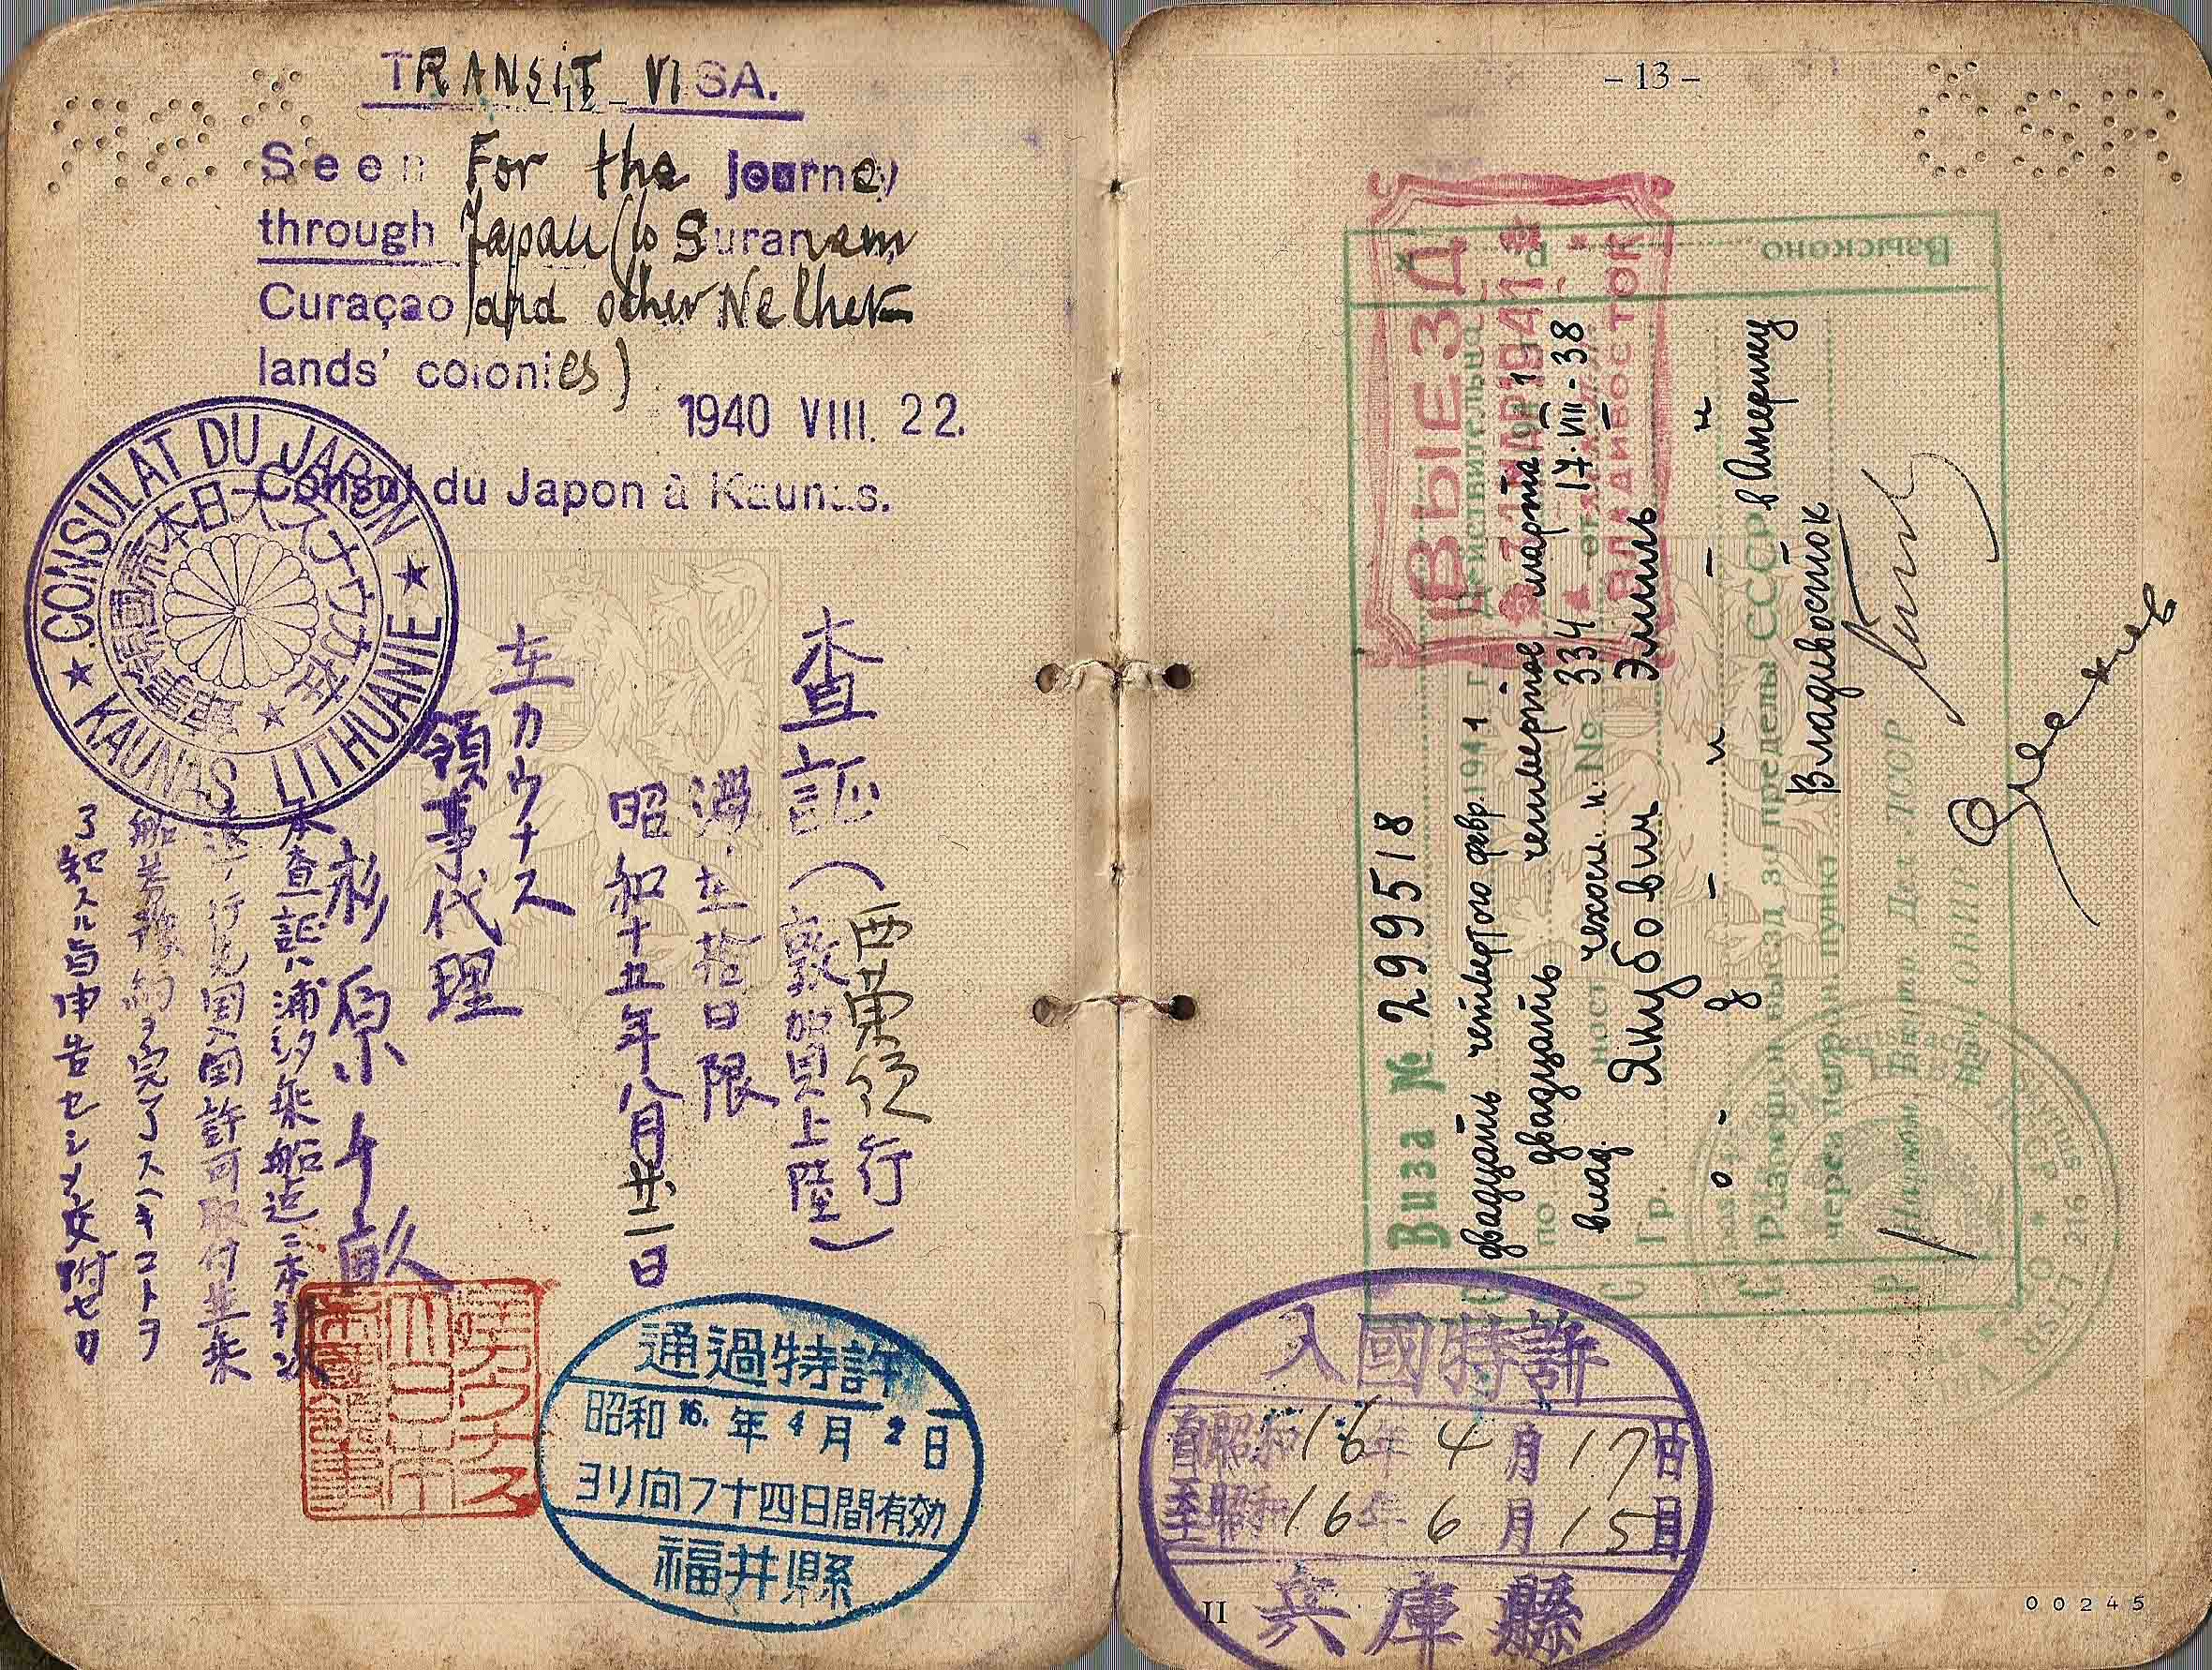 Japan Travel Visa Us Citizen